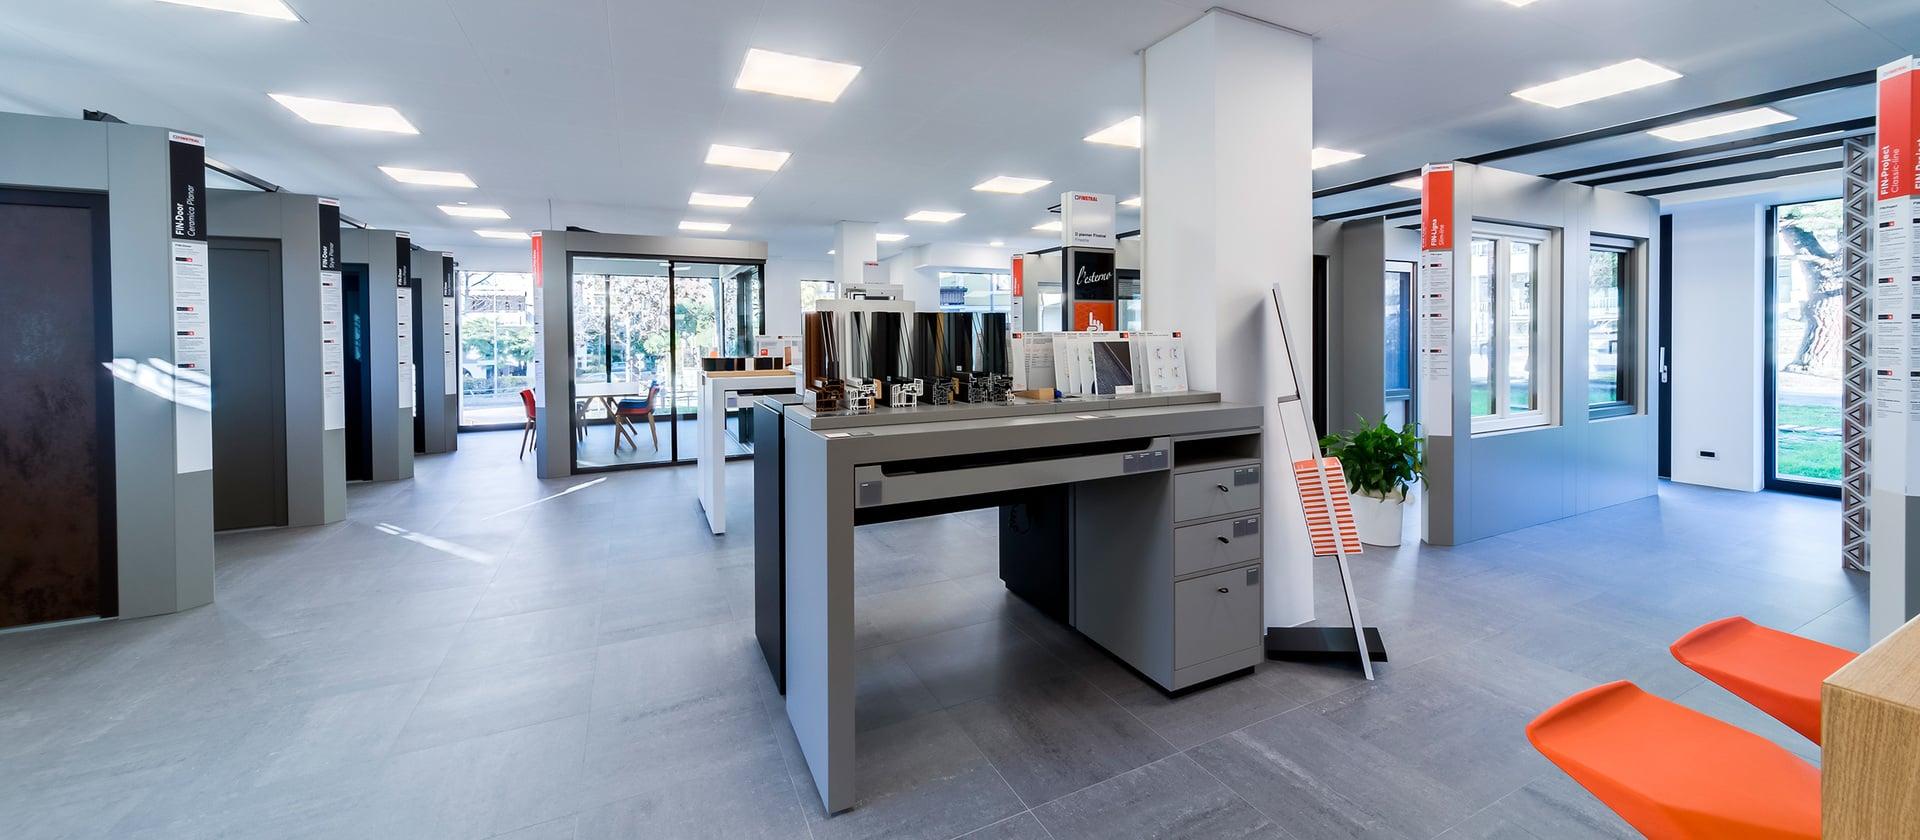 Finstral Studio Meran/Merano